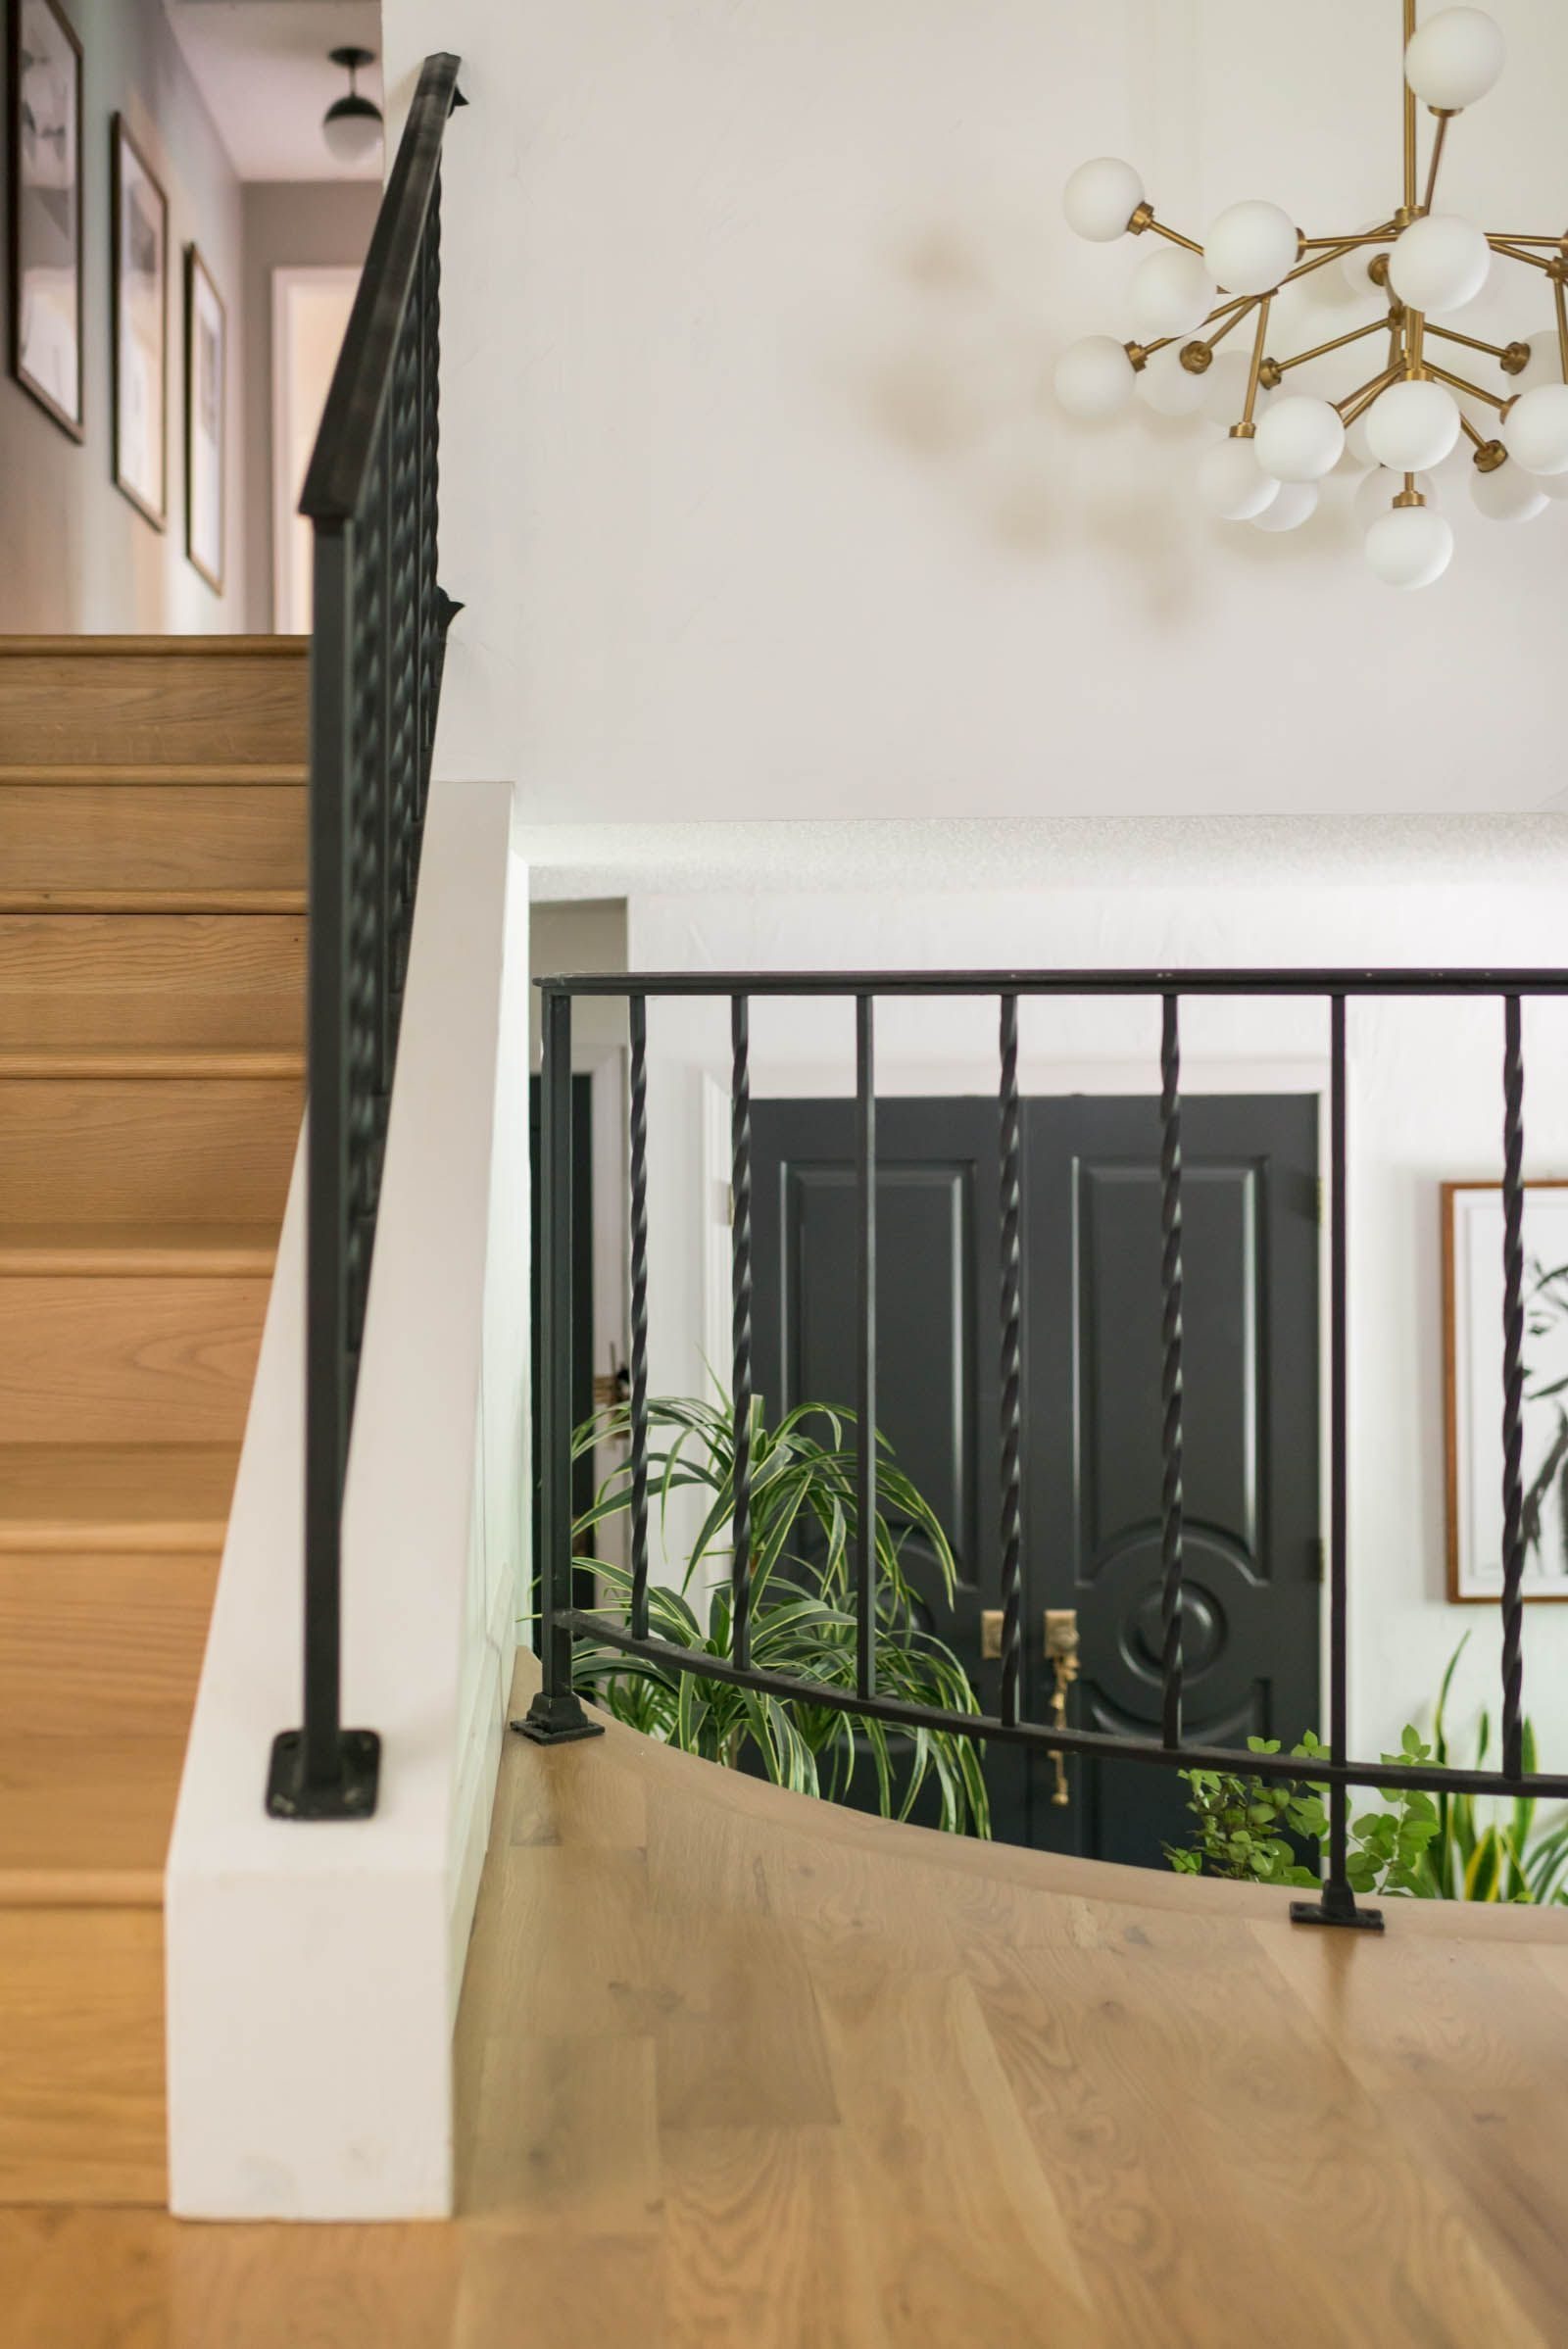 Best Foyer Design Ideas To Copy Asap10